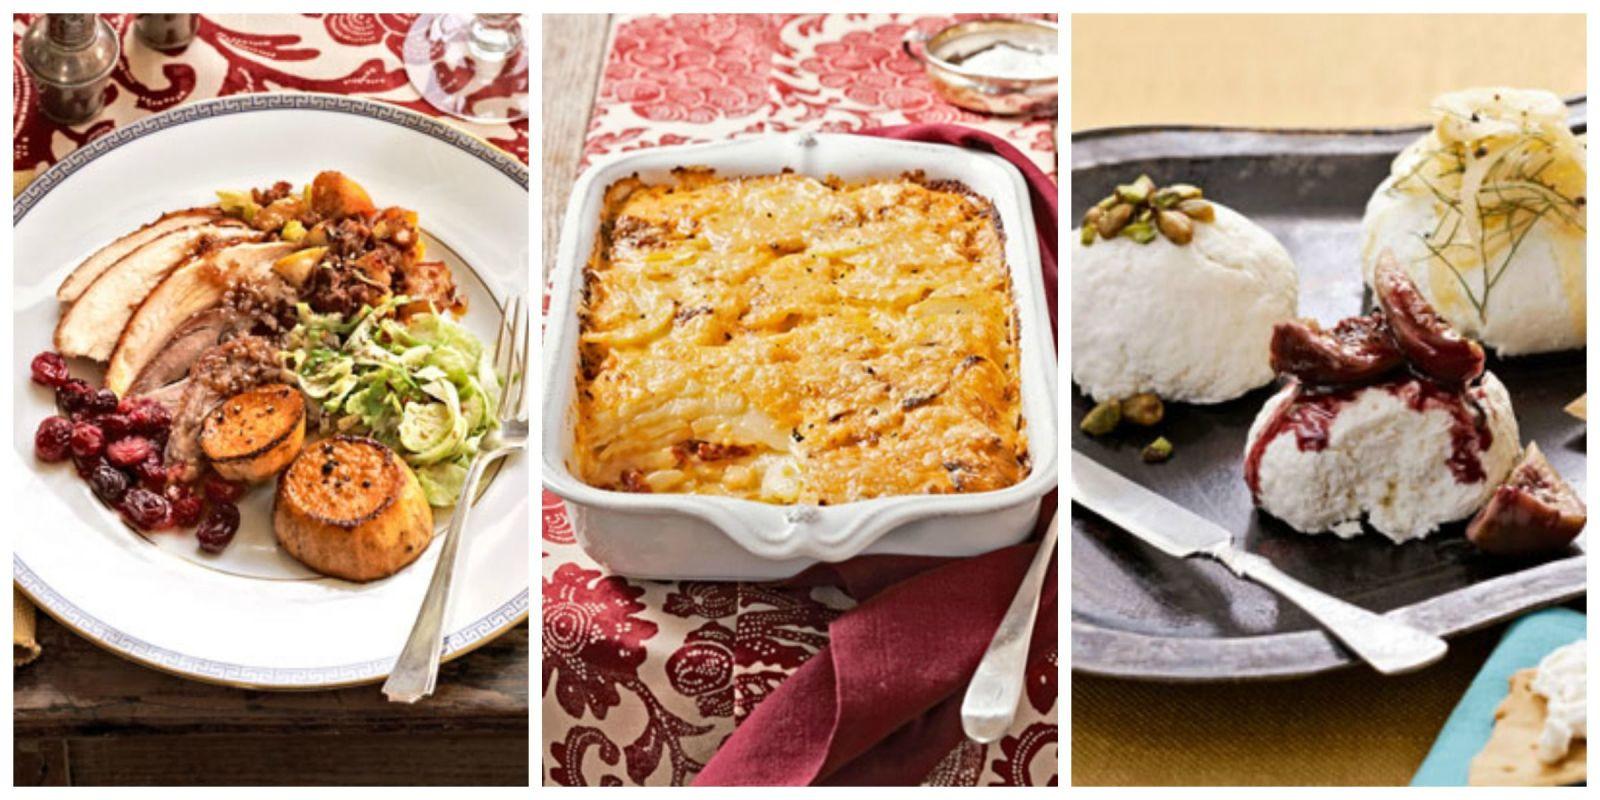 Southern Thanksgiving Dinner Menu  Southern Thanksgiving Dinner Recipes Menu from a